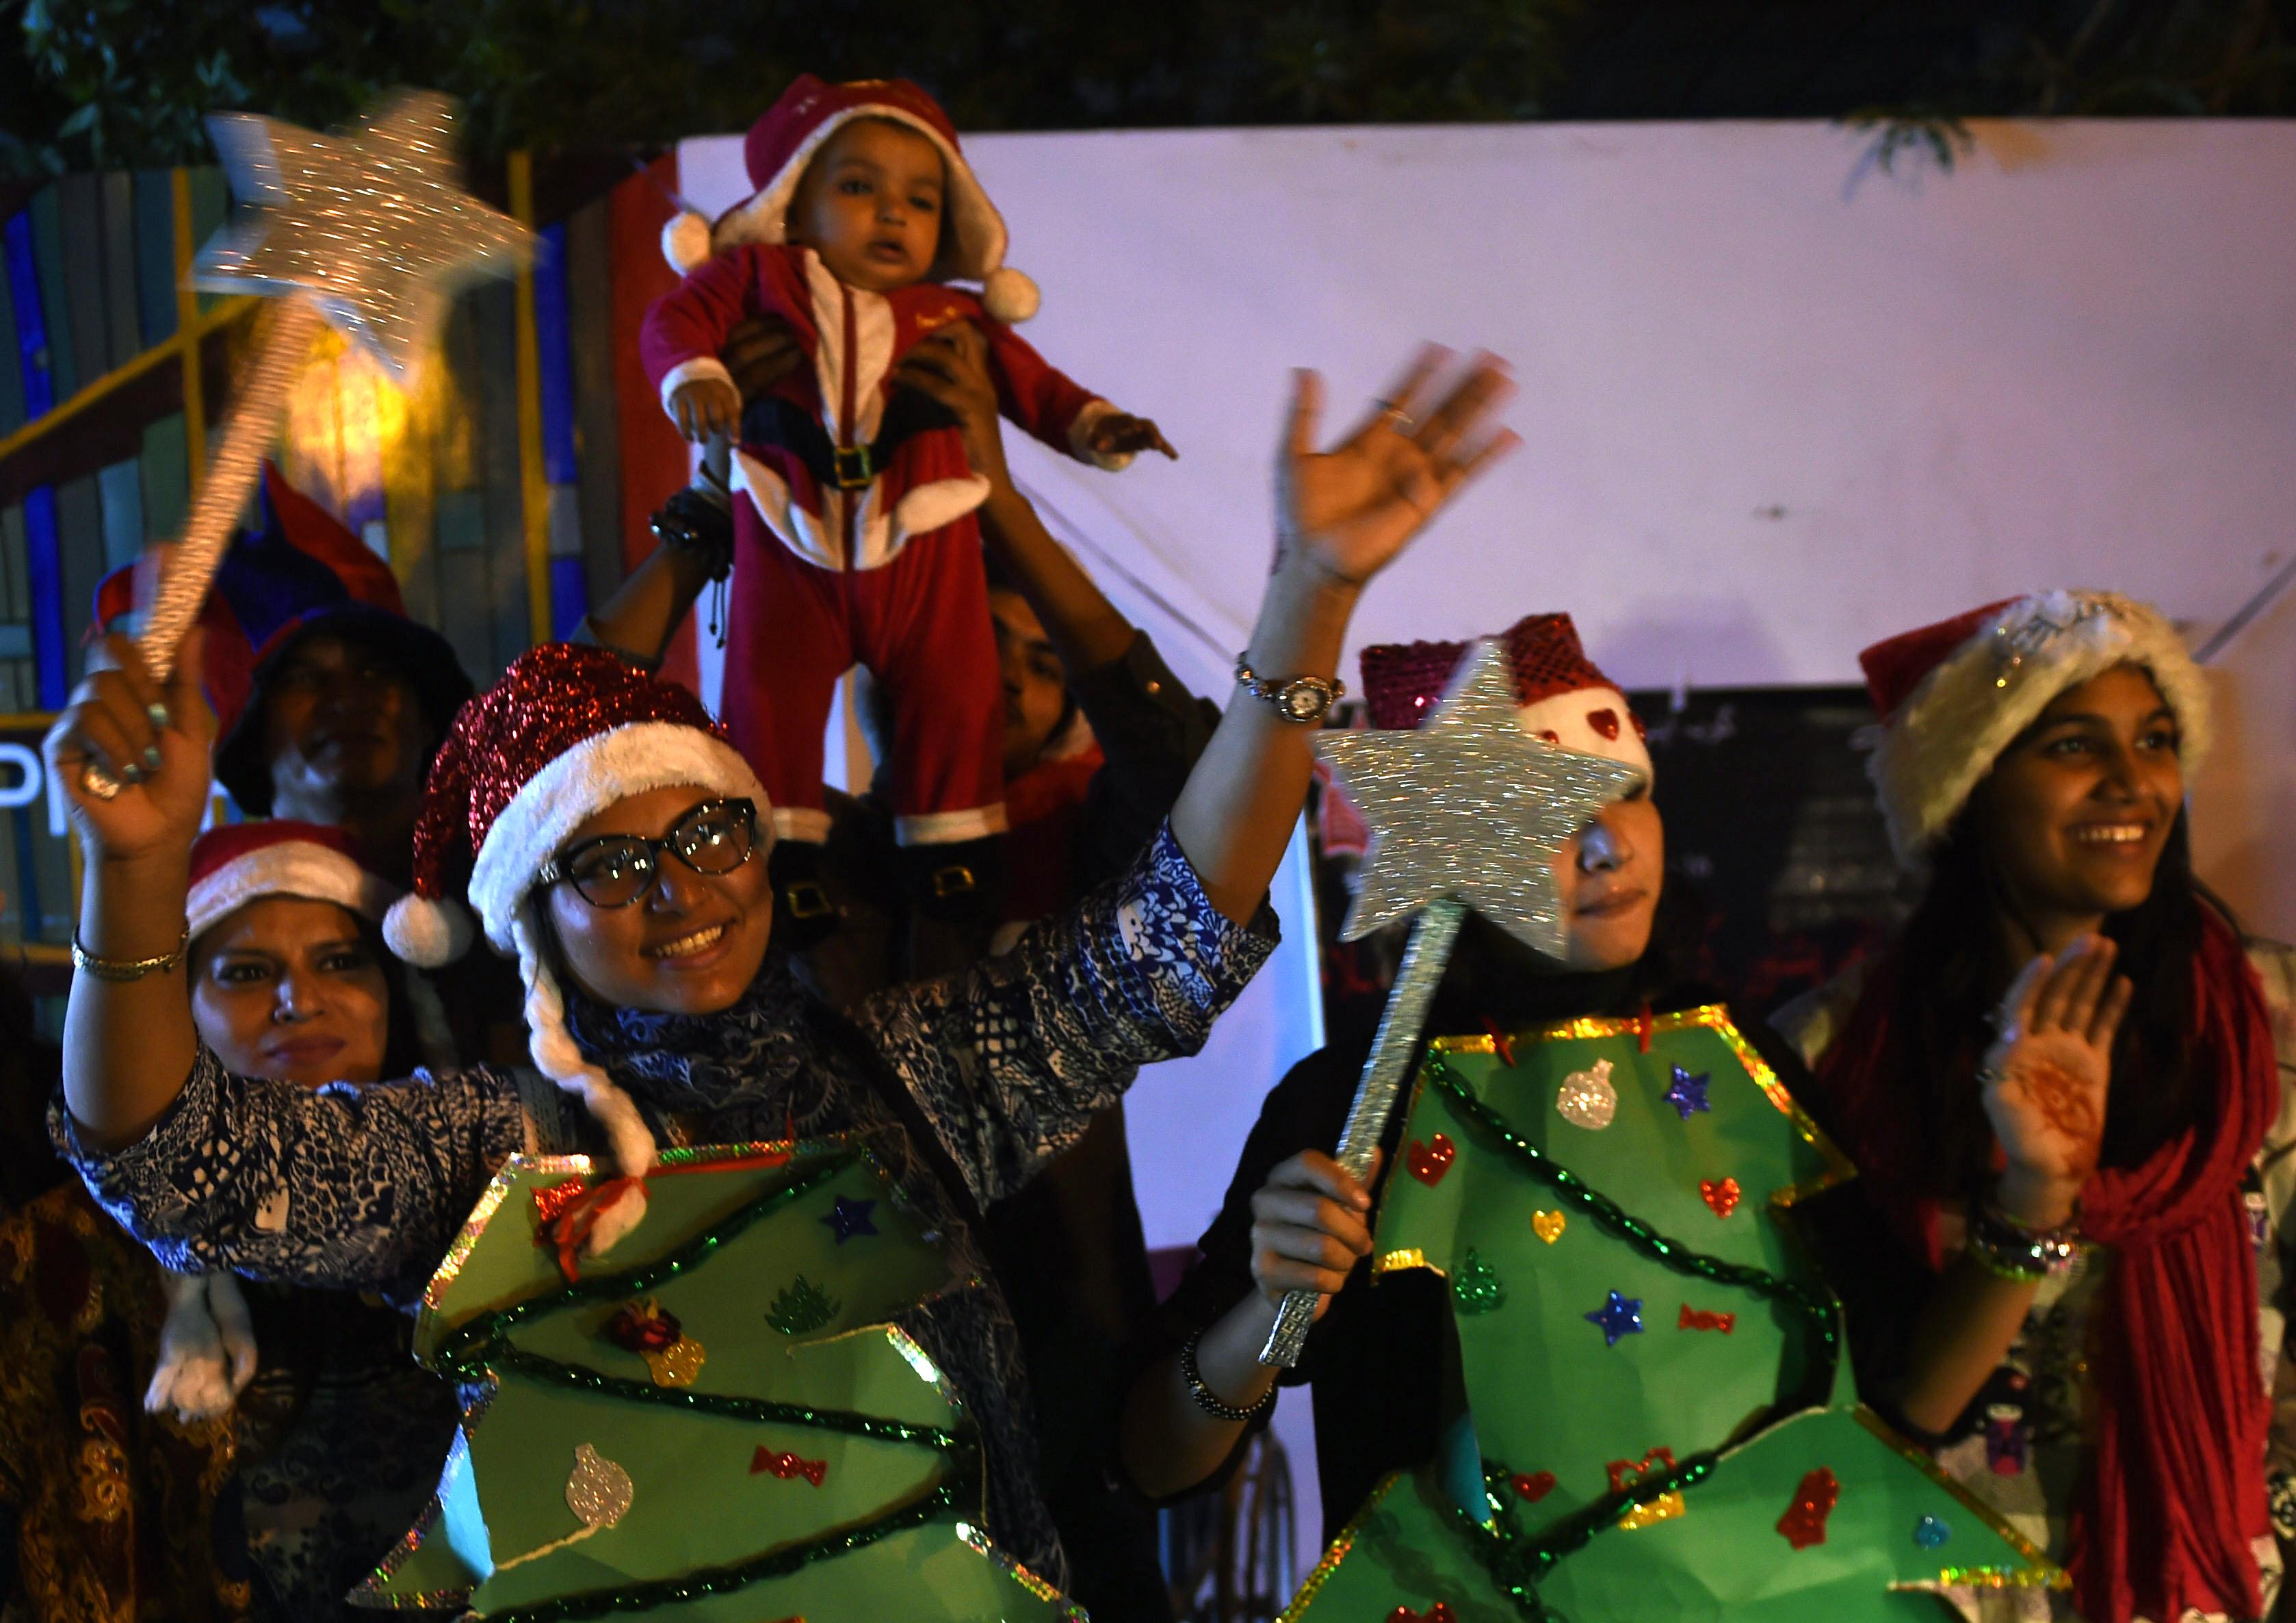 Pakistani Christians celebrate peace ahead of Christmas